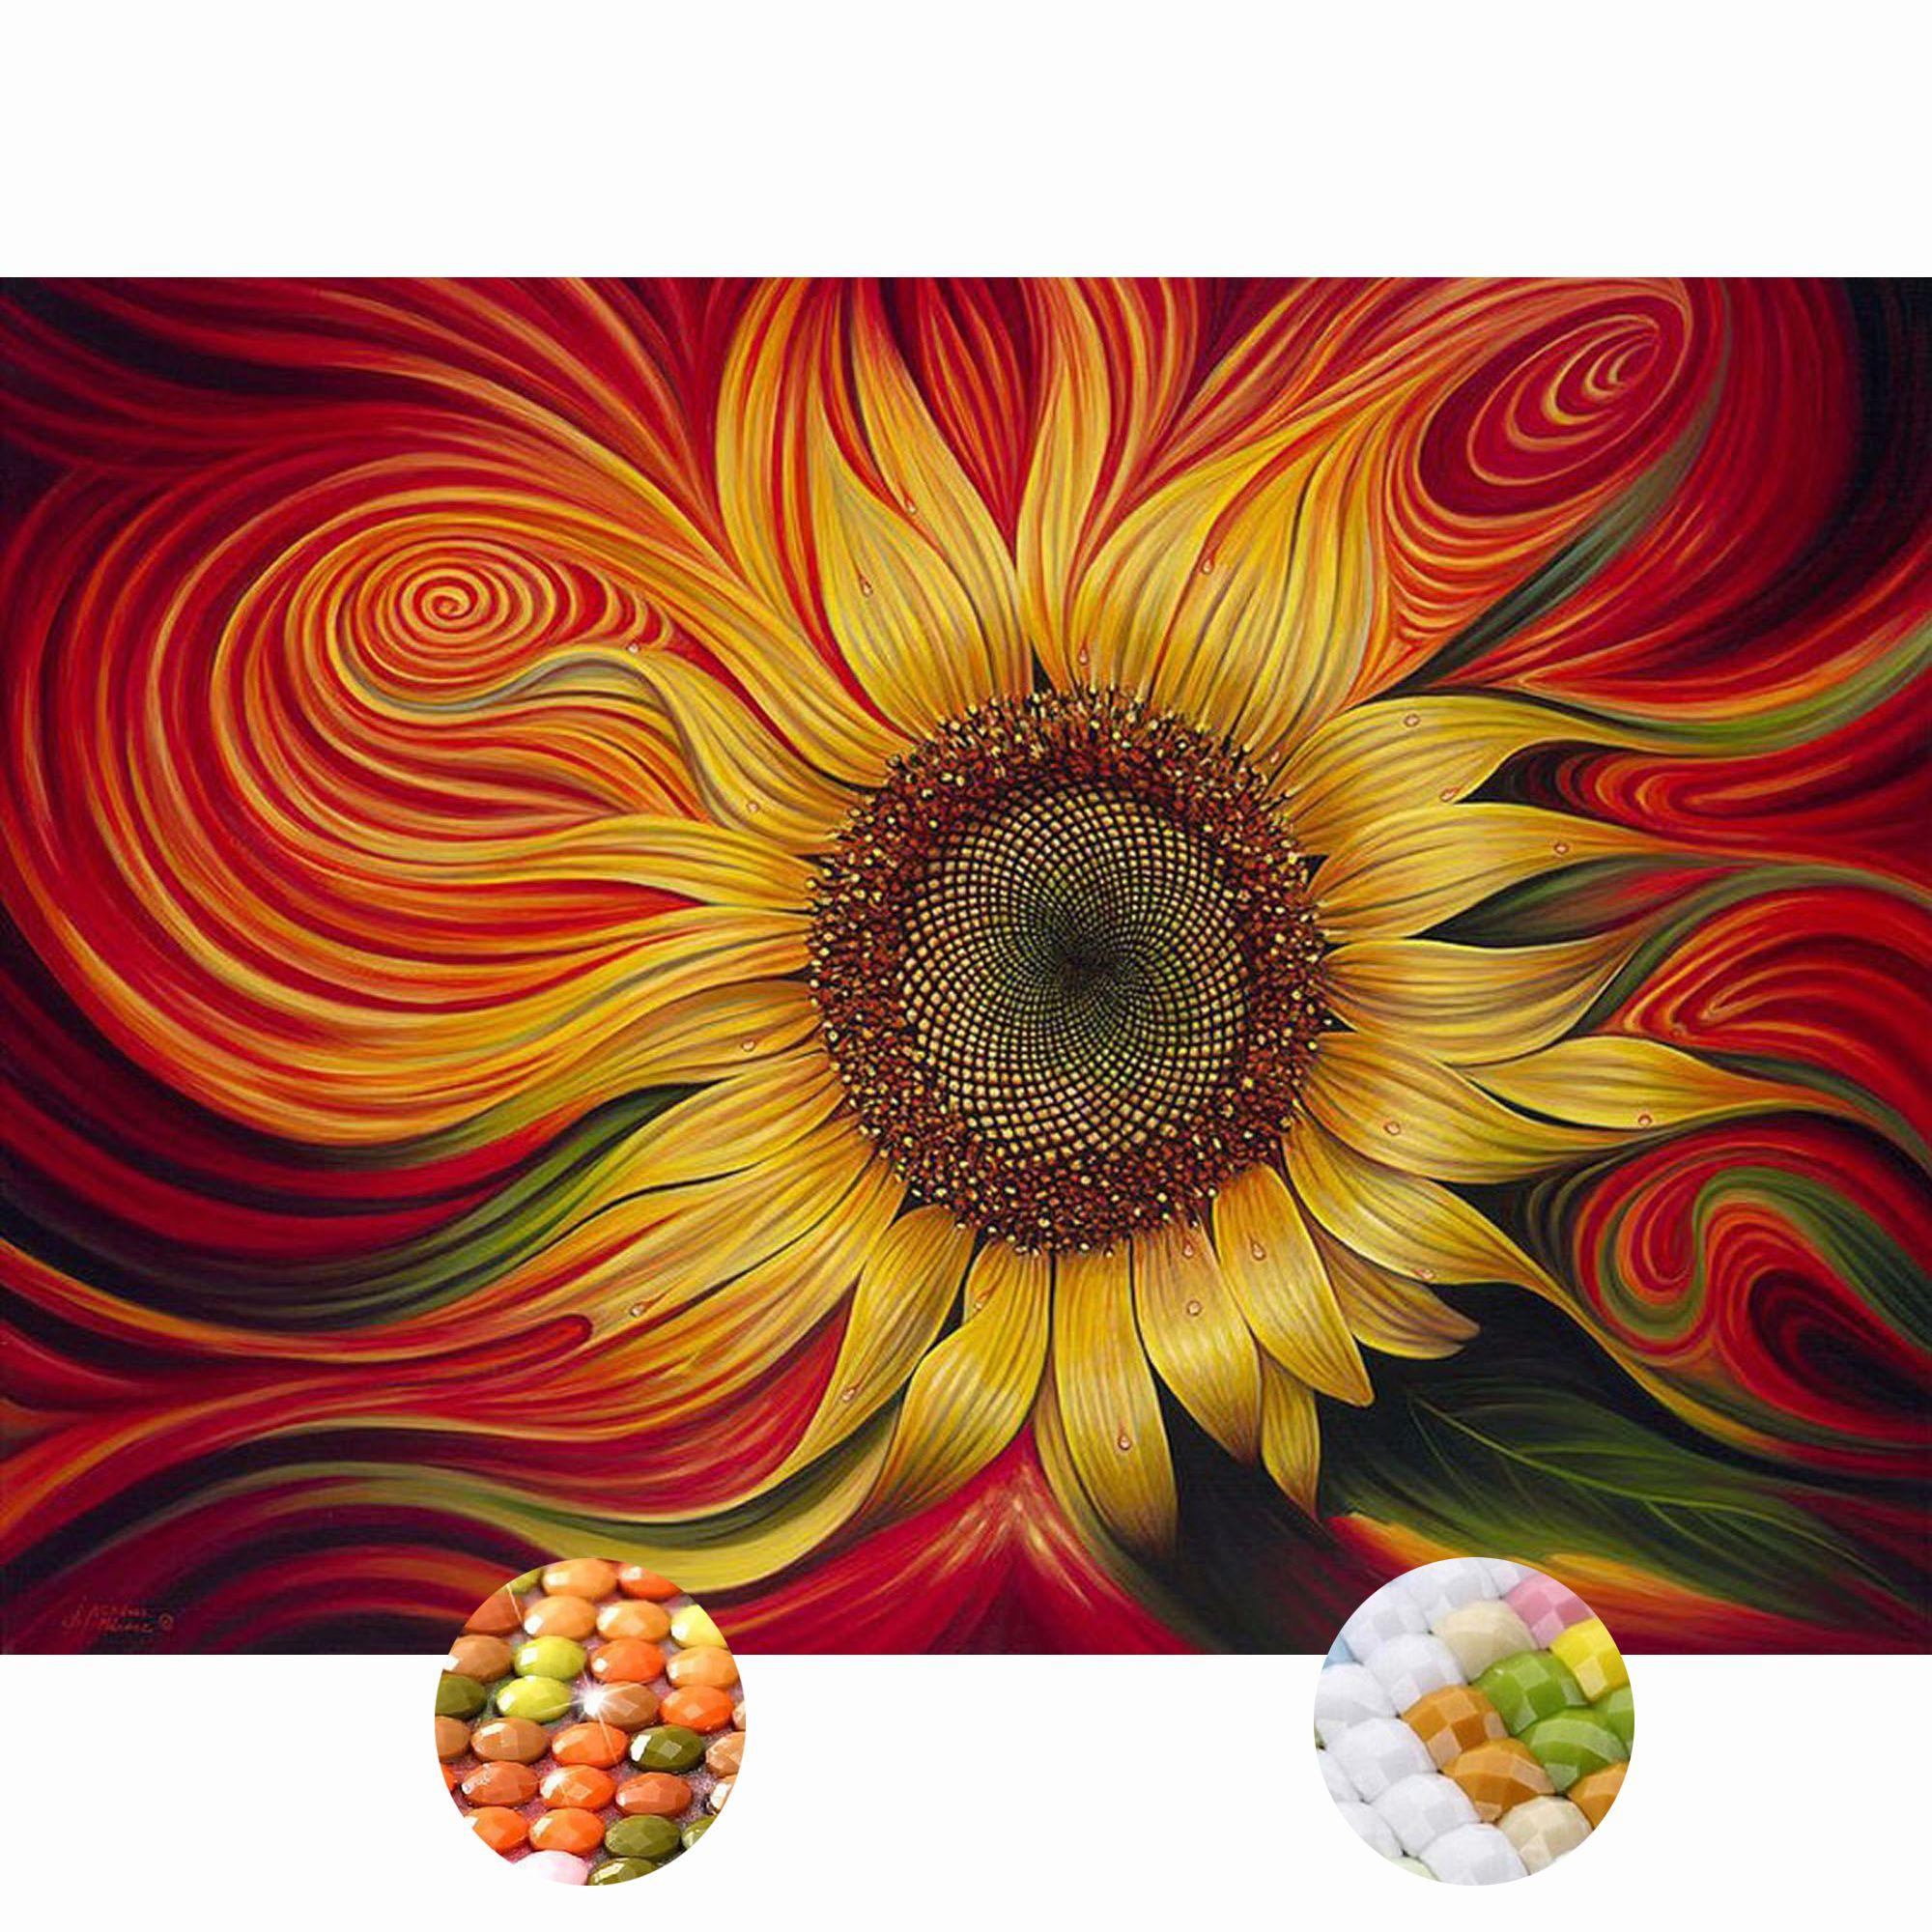 5d diamond painting kit full drill sunflower abstract